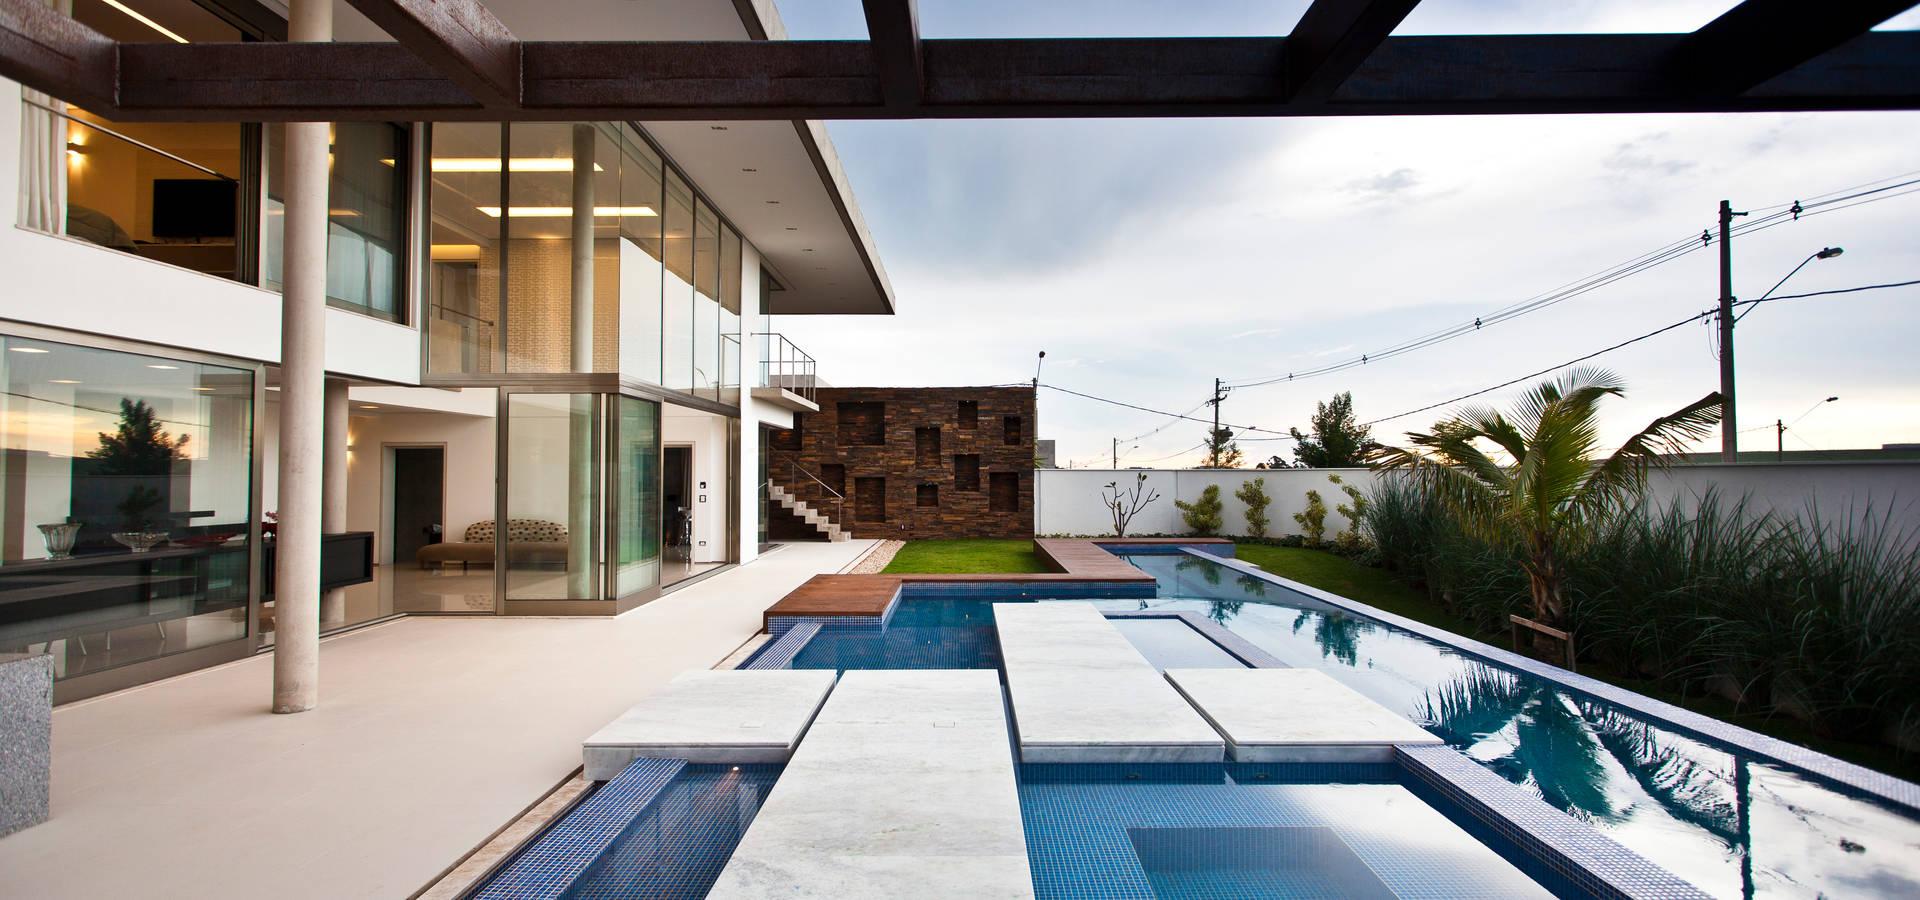 Steck Arquitetura